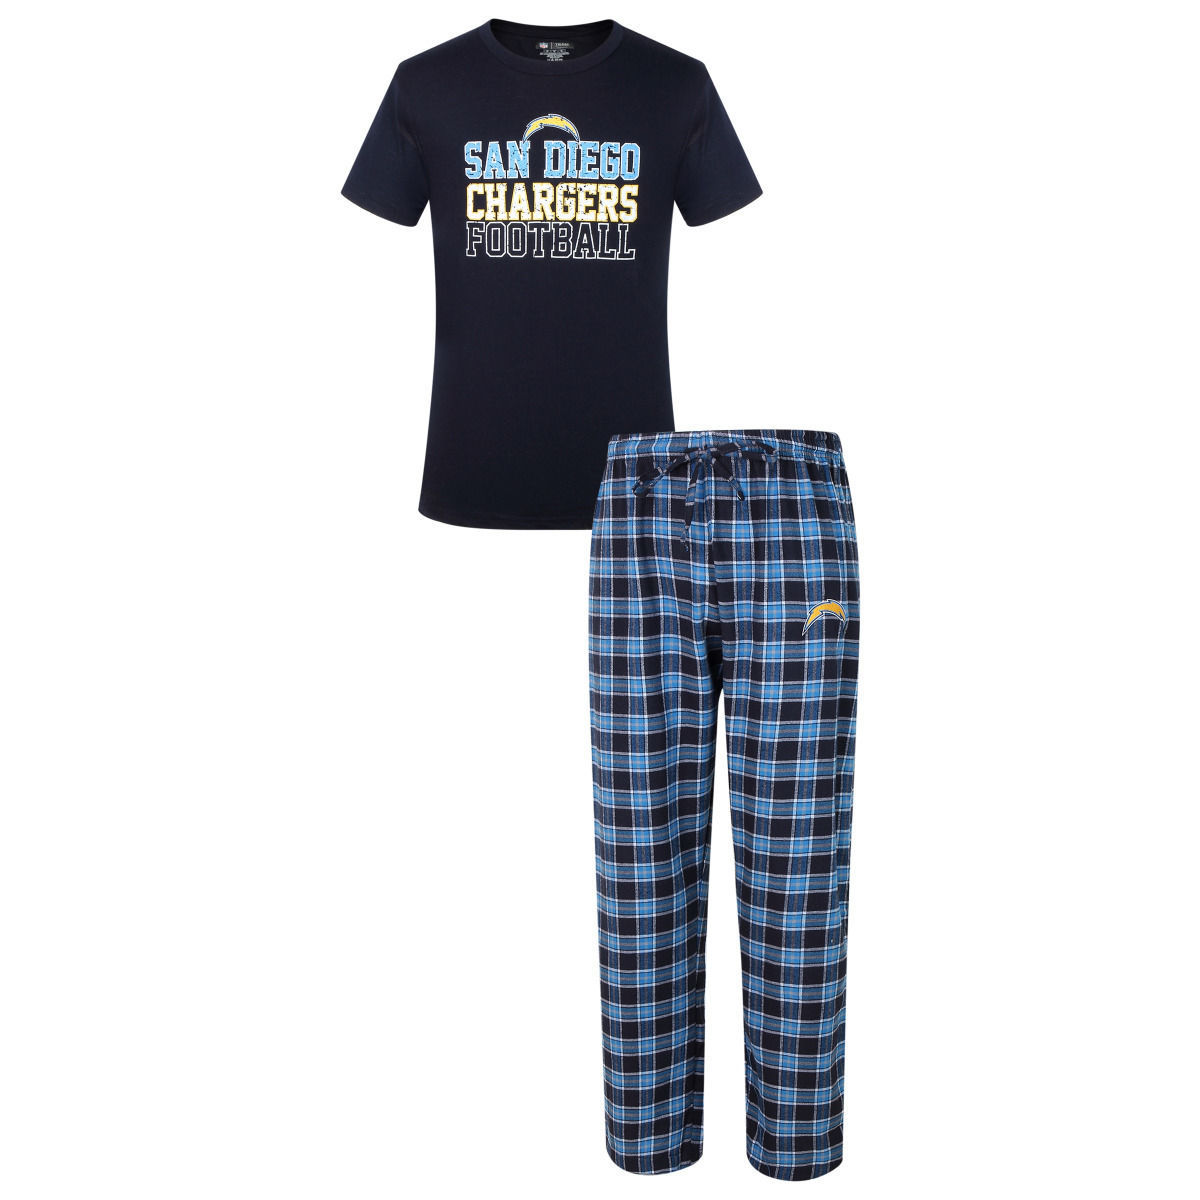 2XL San Diego Chargers Men's Medalist Pajamas NFL Sleep Set Shirt Plaid Pants